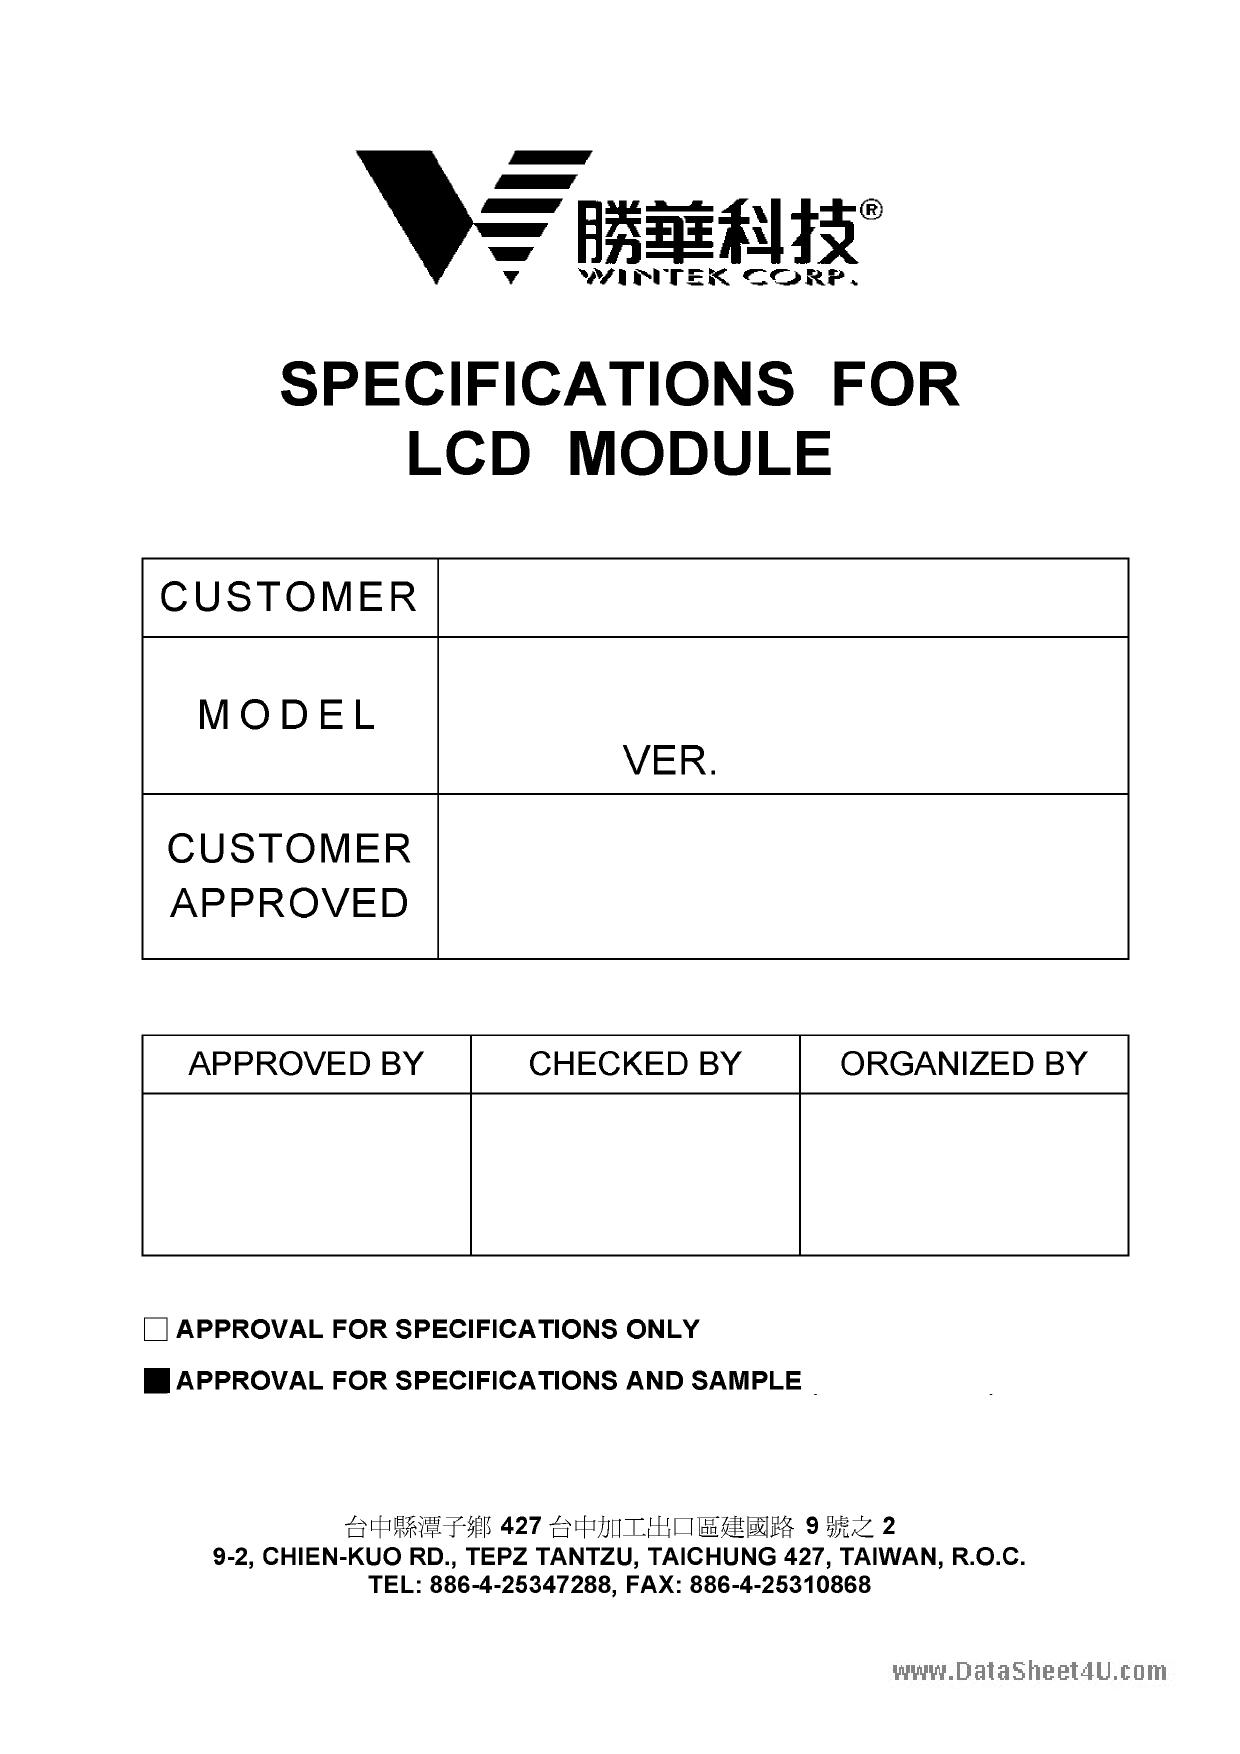 WD-C1602Q-6YLYC datasheet